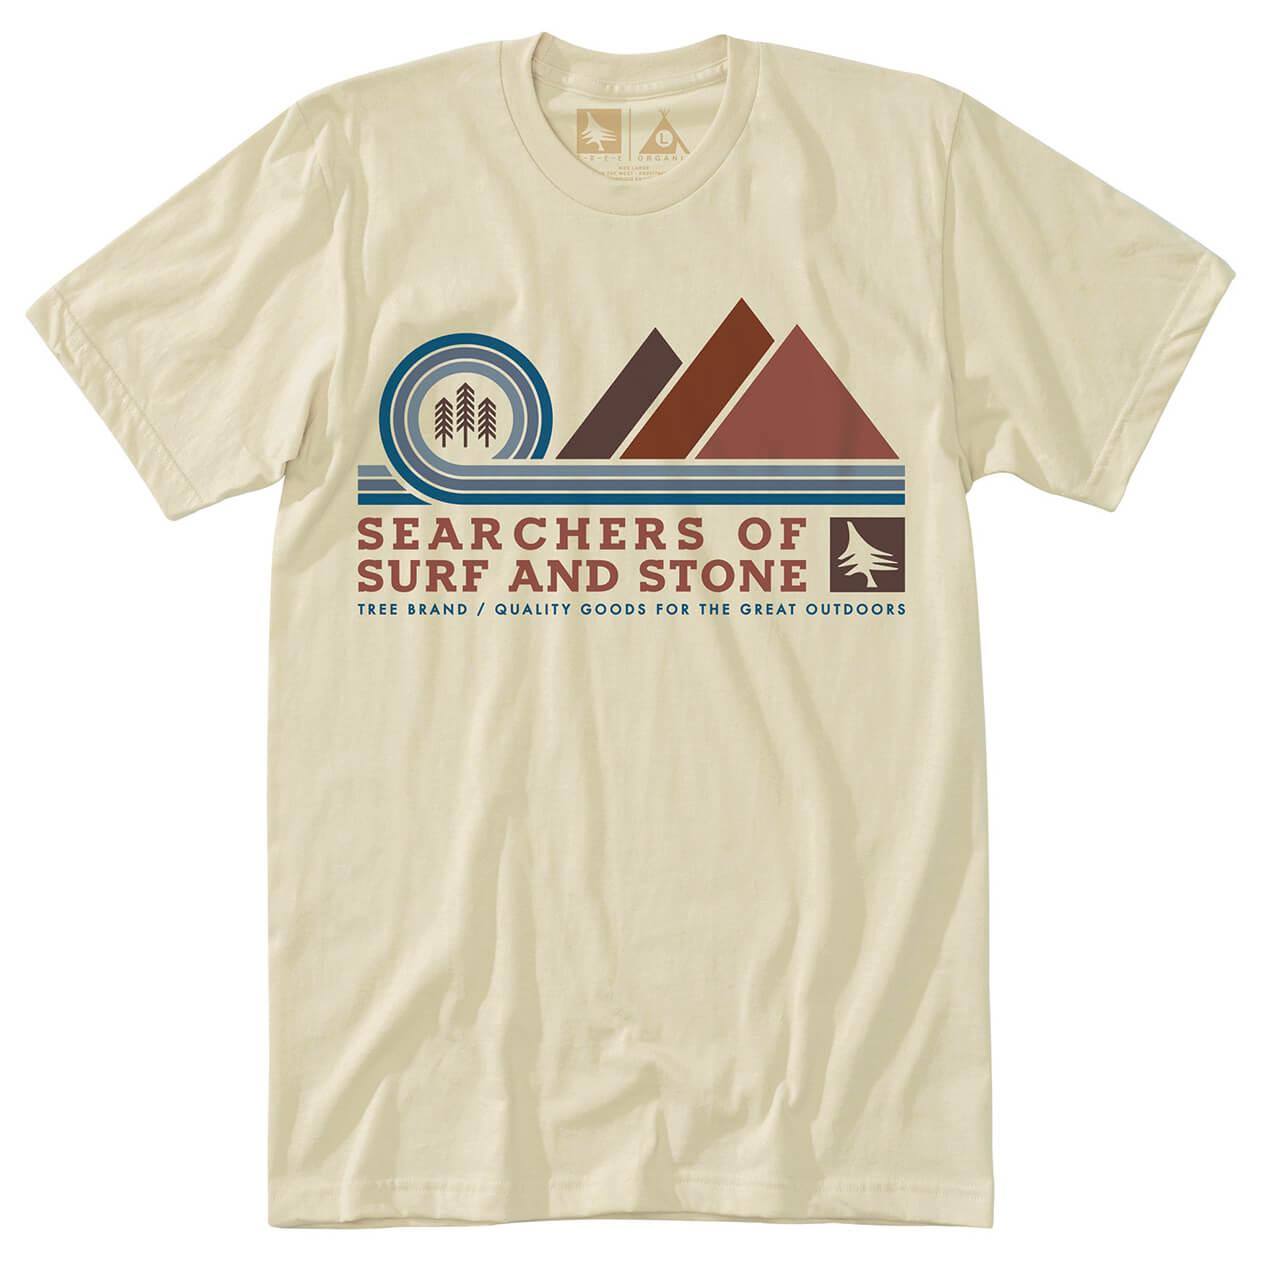 Hippy tree pinnacle tee t shirt homme achat en ligne for Hippie t shirts australia